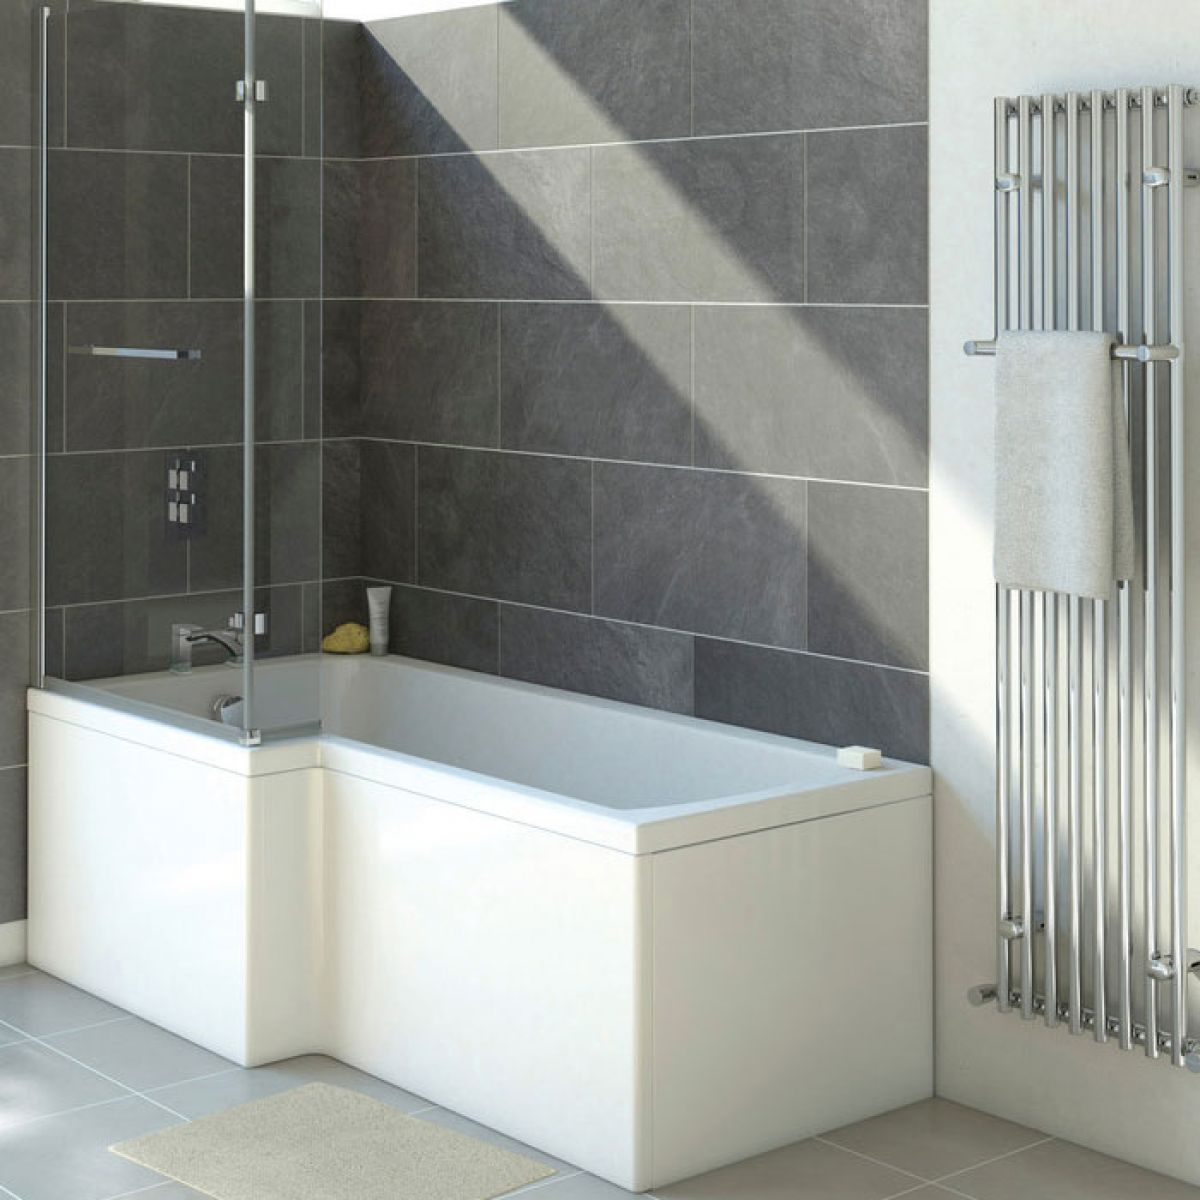 Moods Solarna Shower Bath End Panel 700 - 750mm